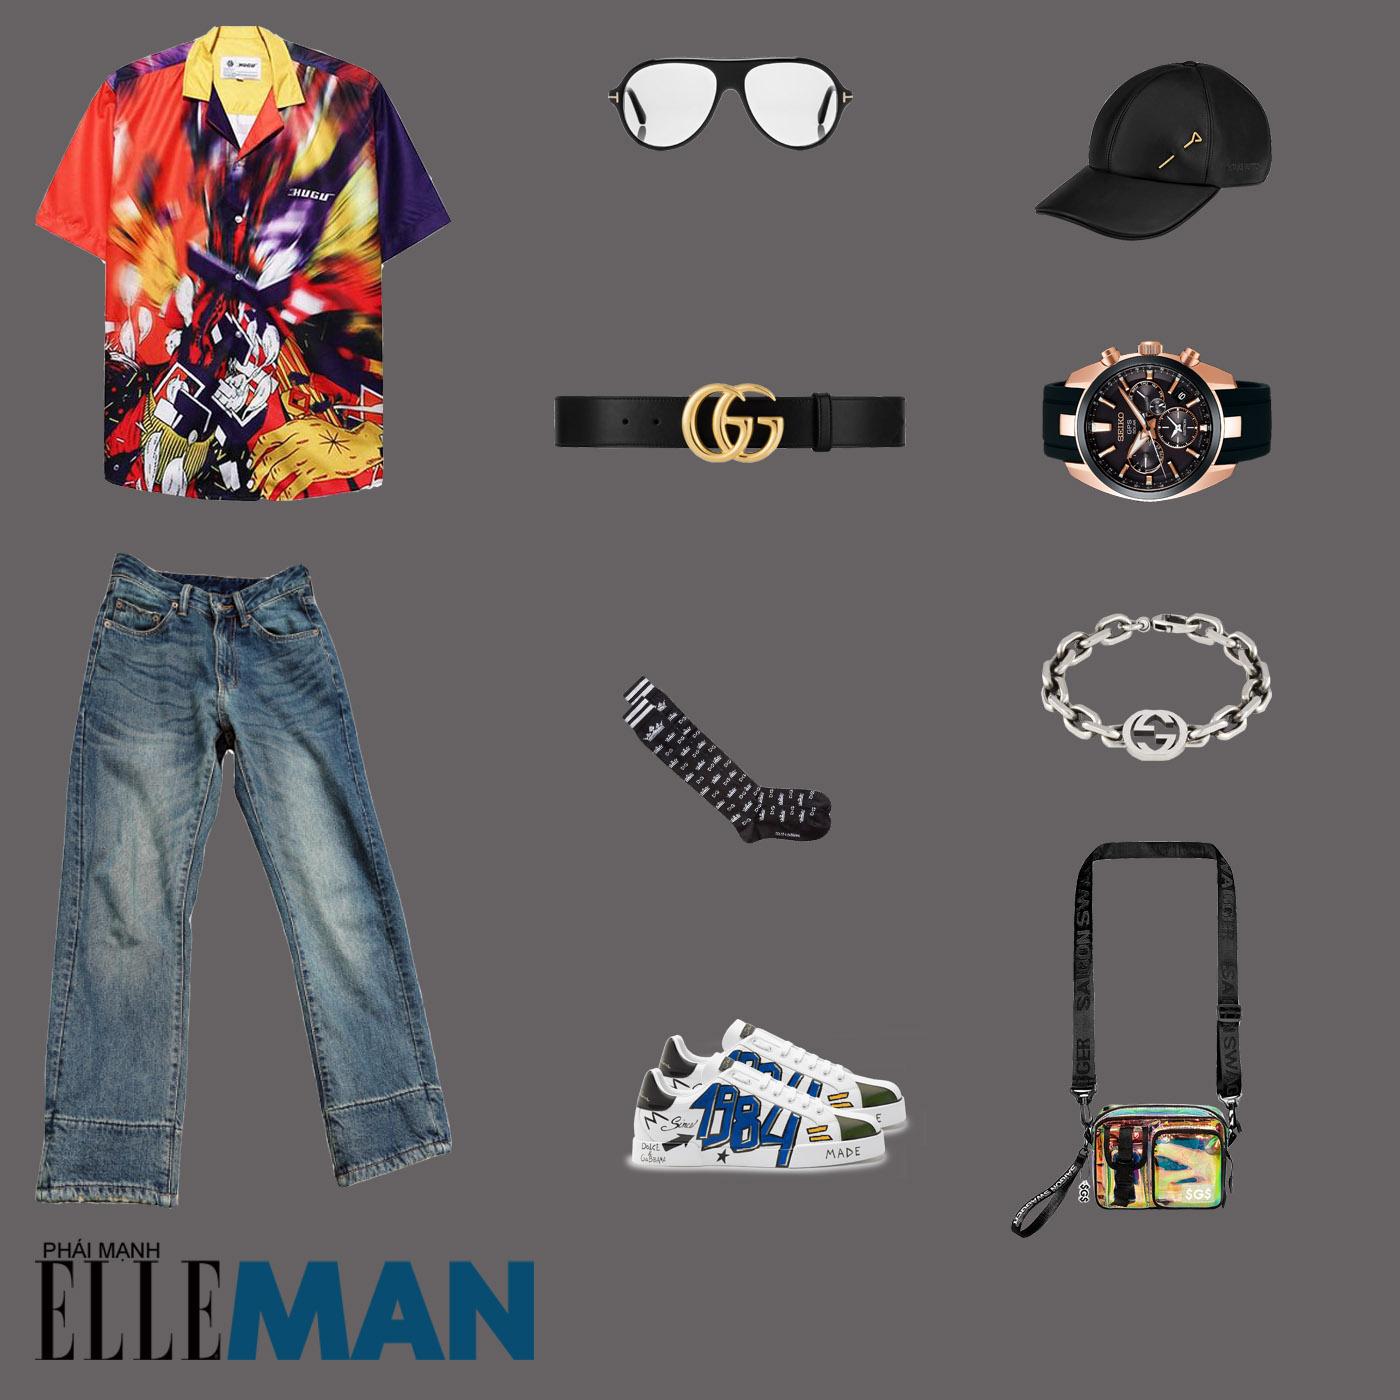 outfit 2 - phối đồ với quần dad jeans